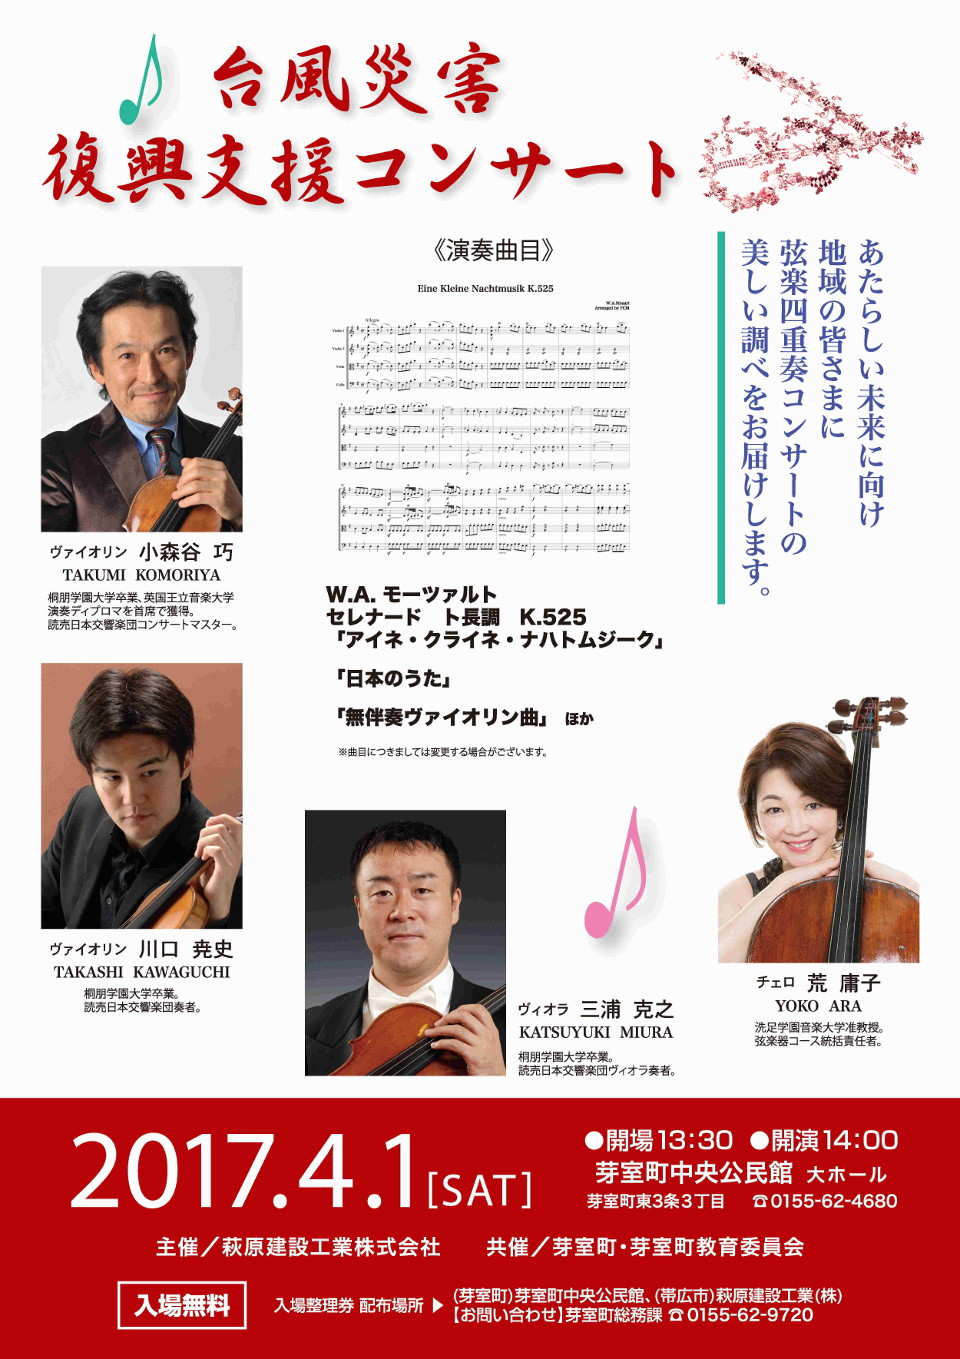 台風被害復興支援コンサート